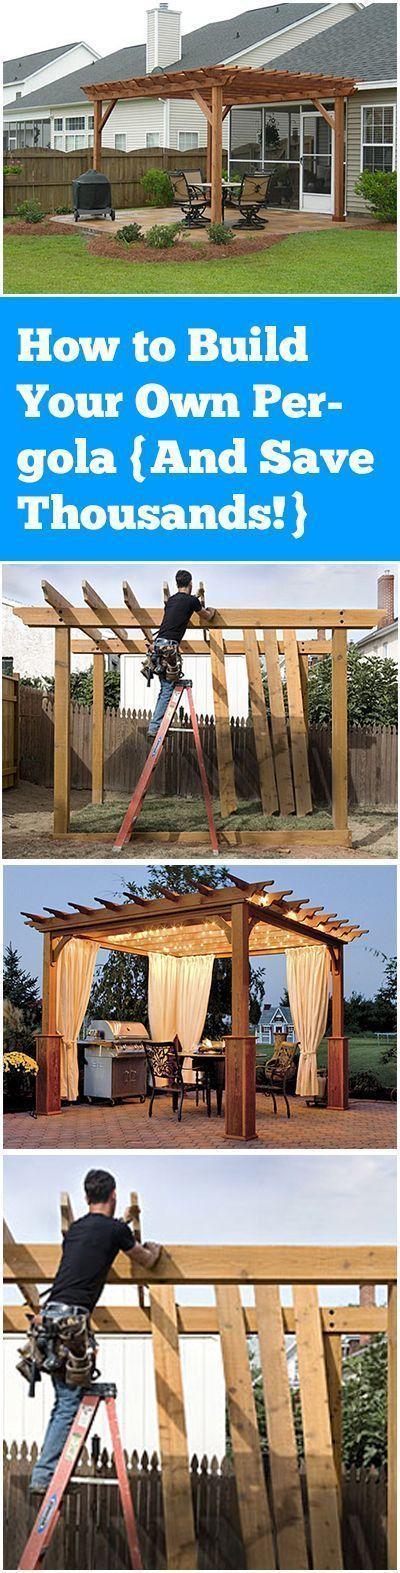 How to Build Your Own Pergola {And Save Thousands!} #backyardlandscapediytutorials